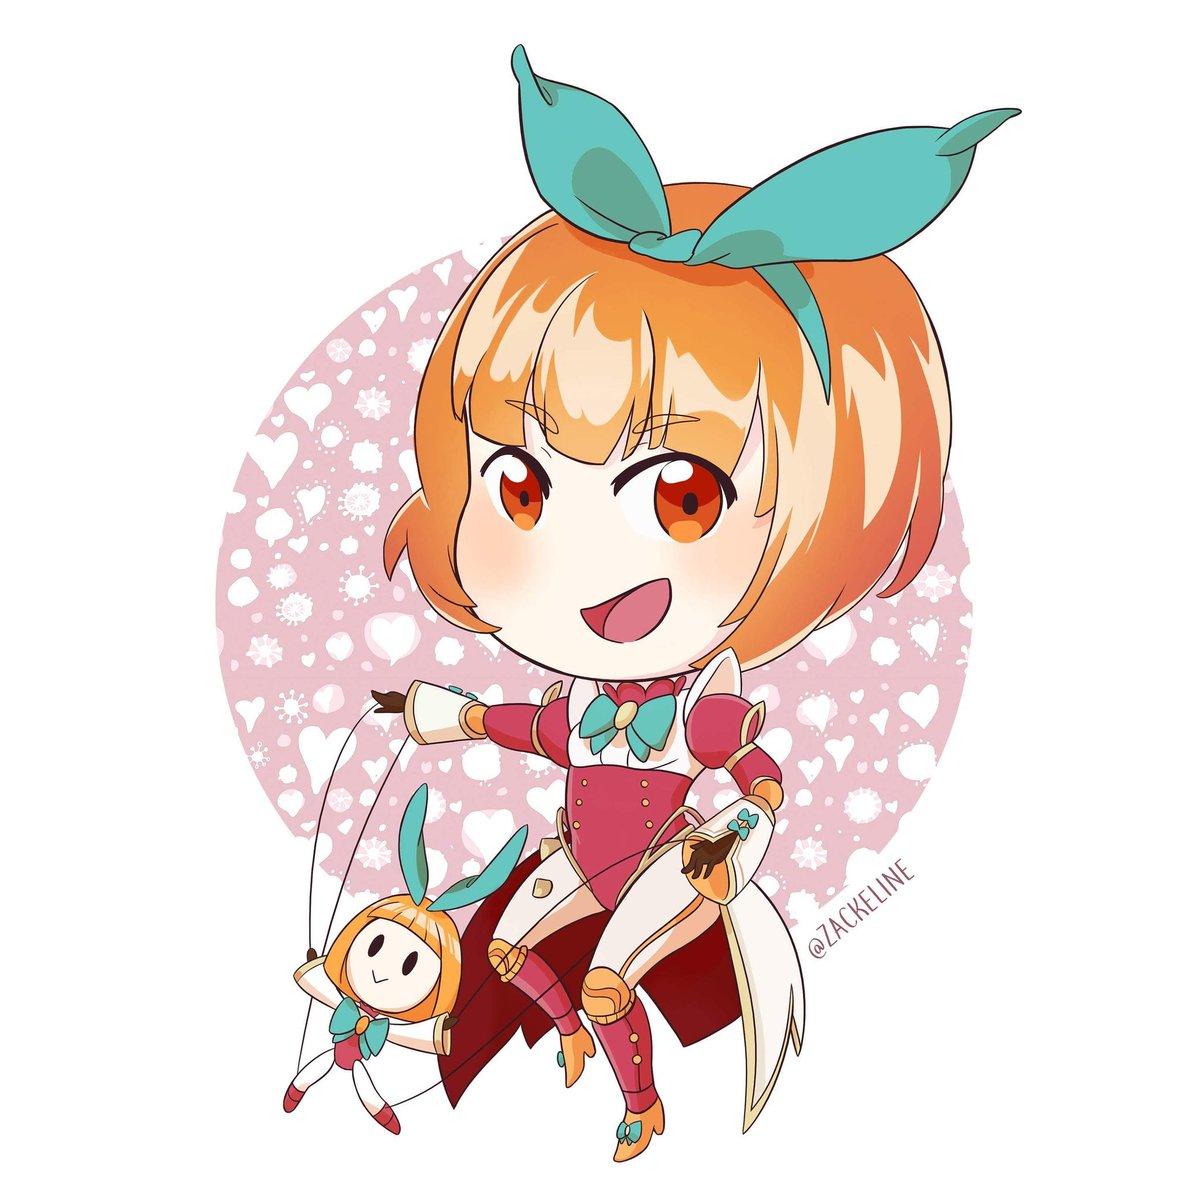 Mobile Legends Angela Fanart | Anime Wallpaper